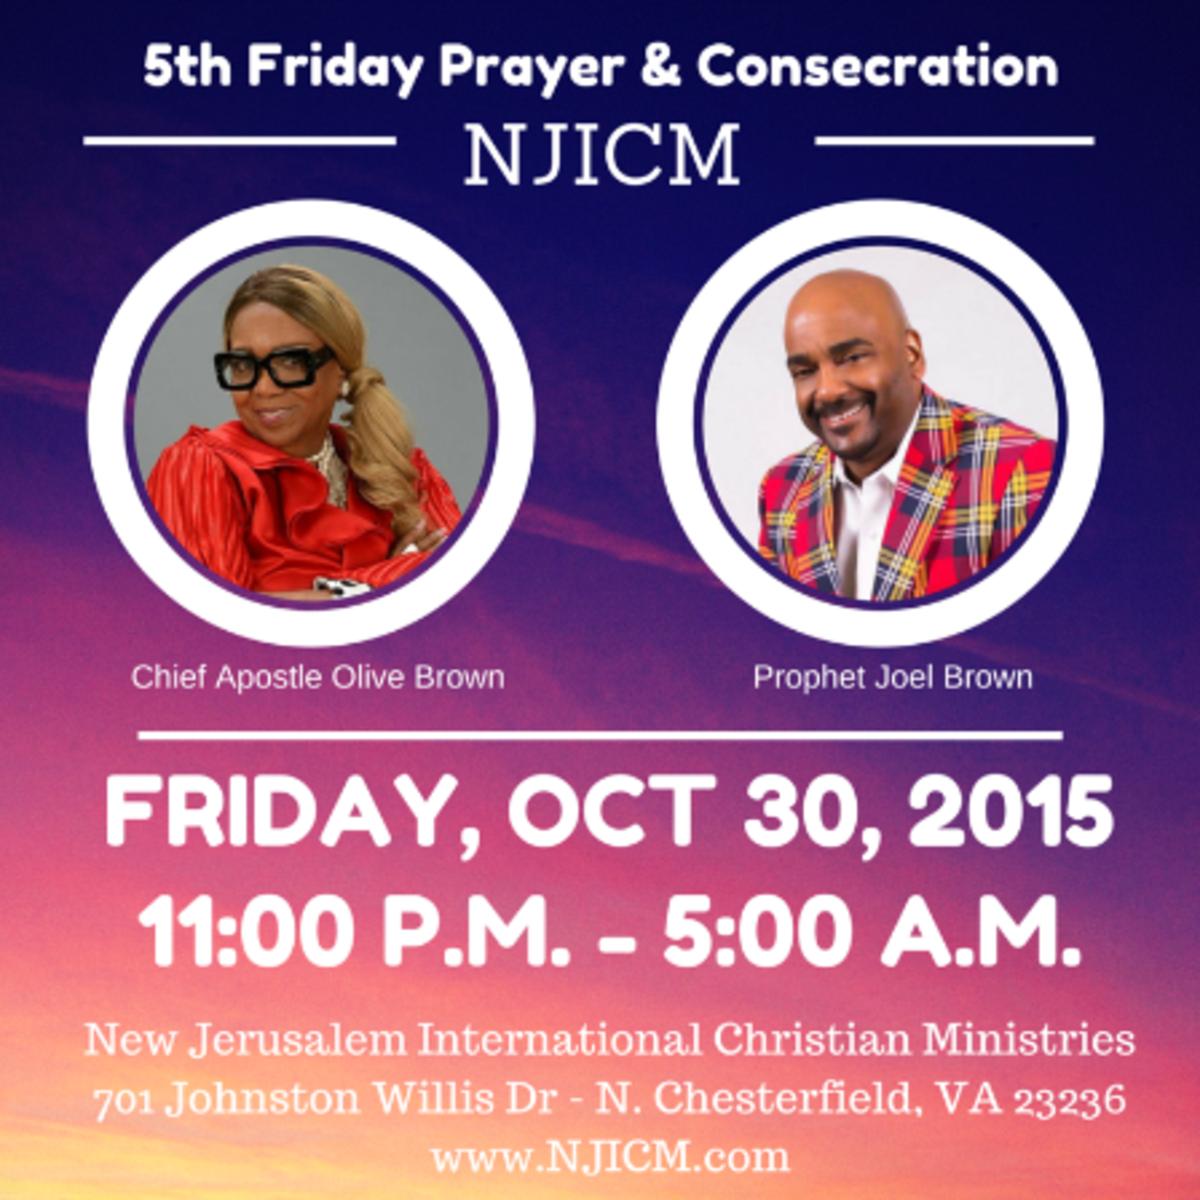 POWERFUL WEEK OF PRAYER & FASTING! May 26-29